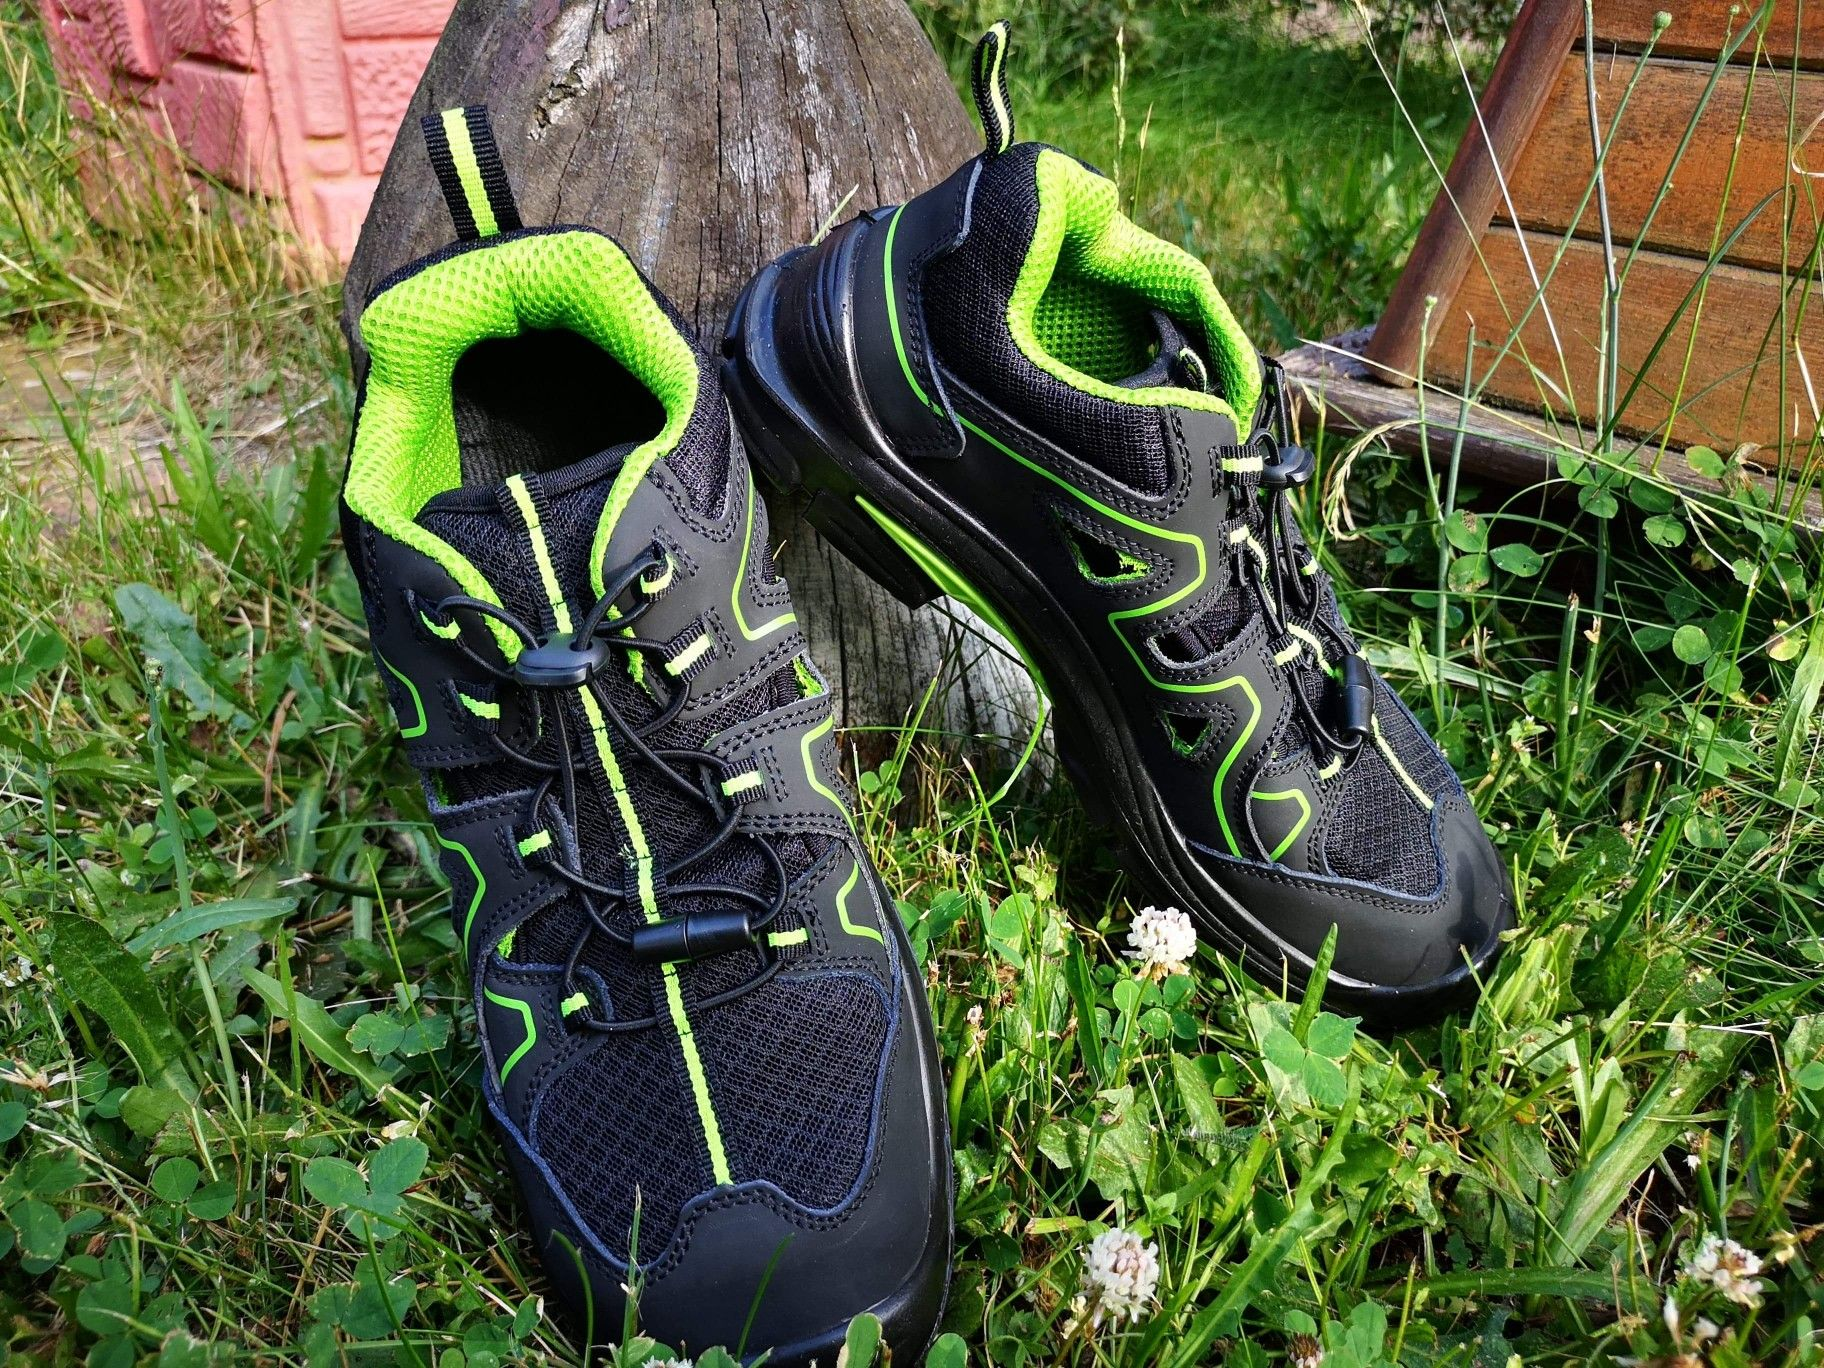 Sandaly Ochronne Bca Brema Reis Hoka Running Shoes Hiking Boots Boots